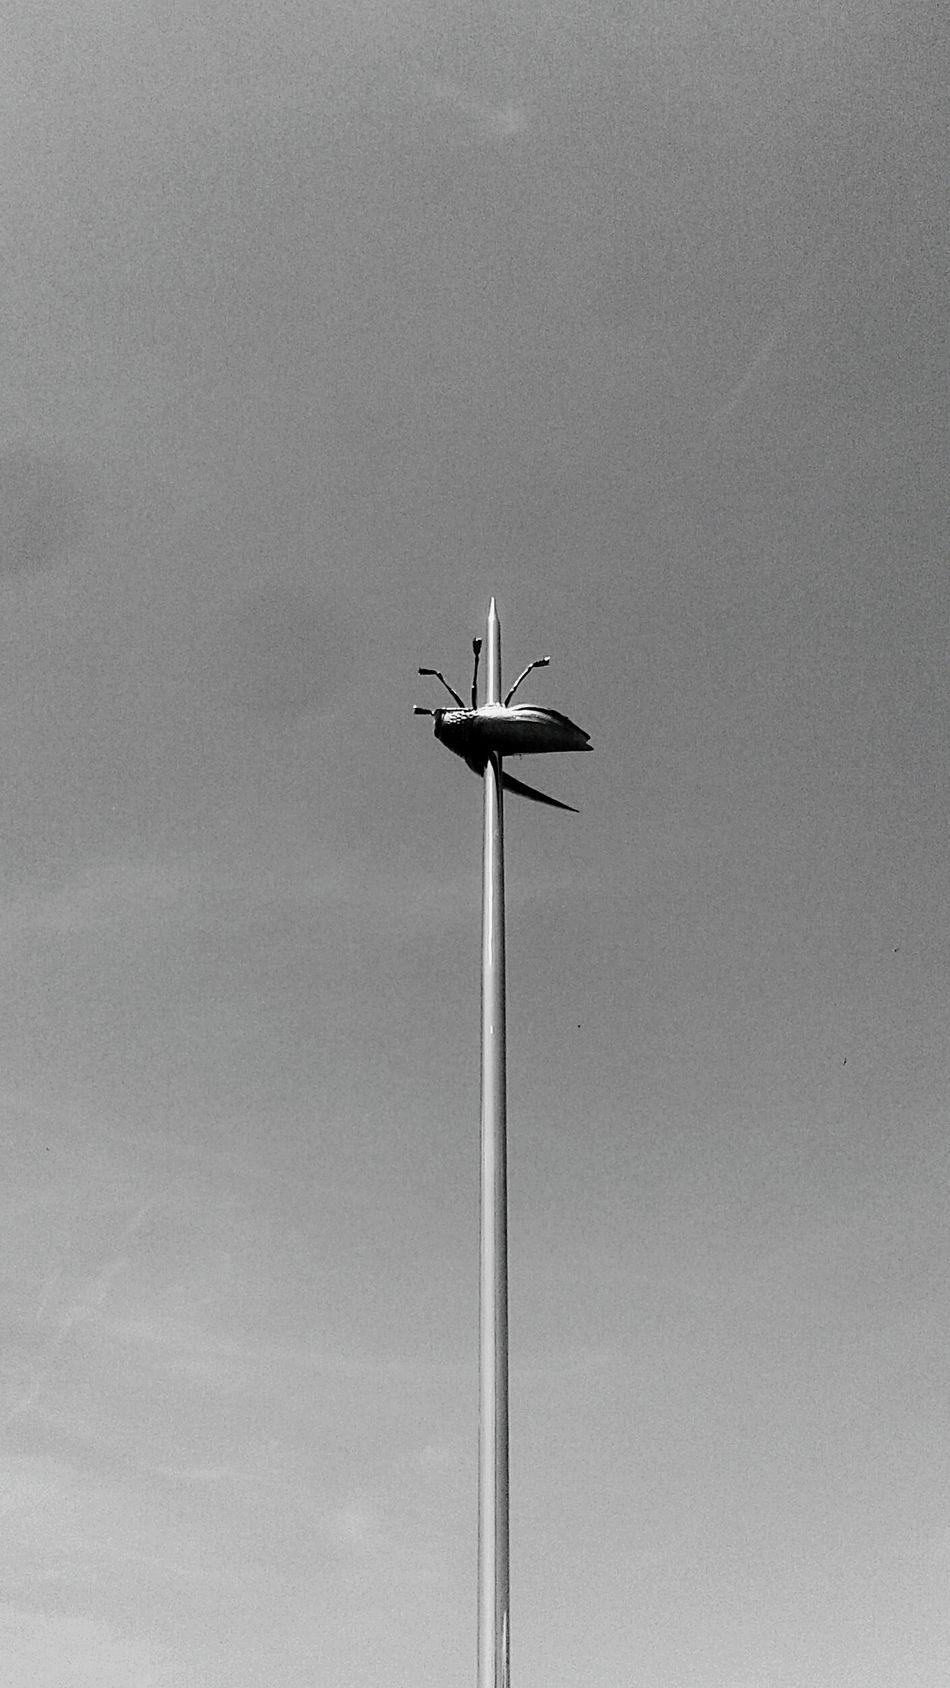 Fly Needle Insect Igła Mucha Blackandwhite Fine Art Photography